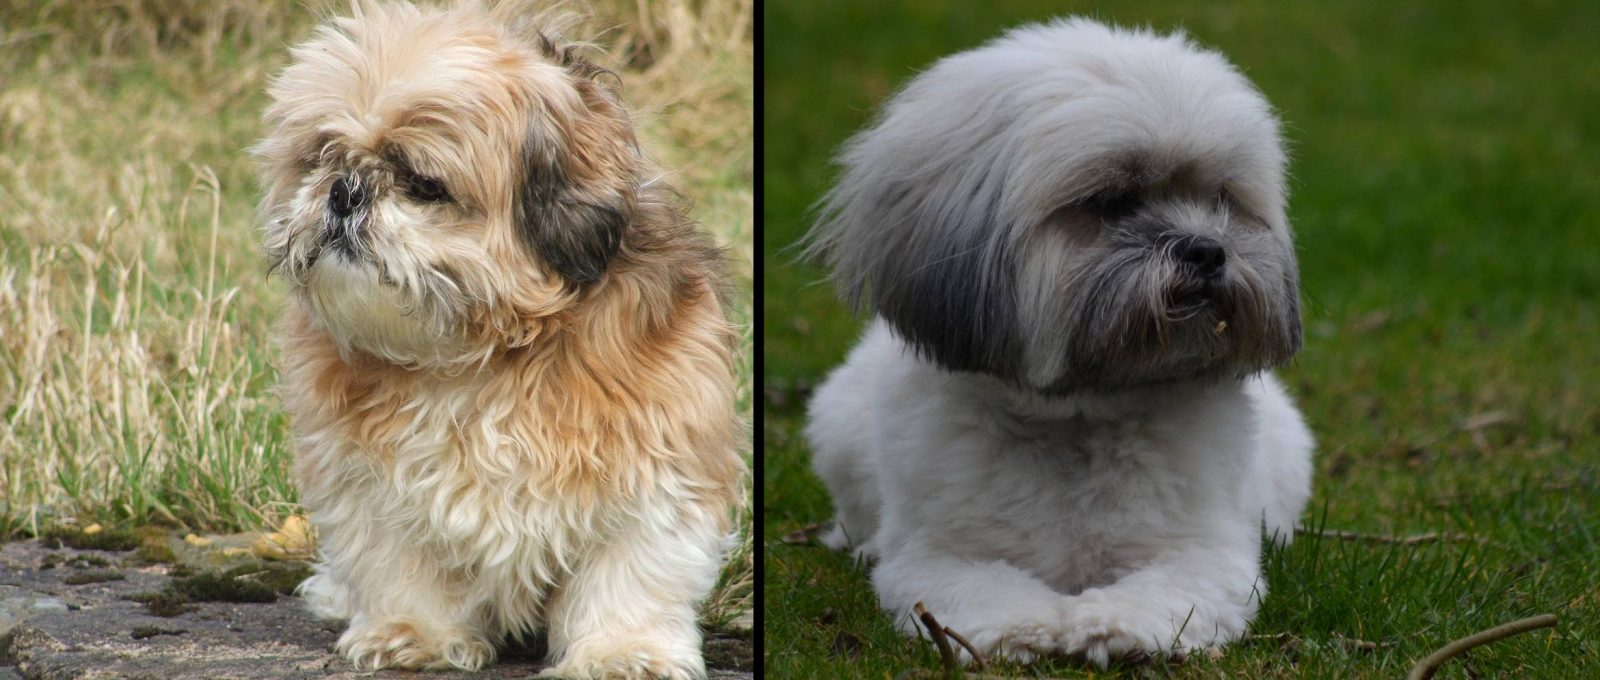 Shih Tzu dog (left) vs Lhasa Apso dog (right)